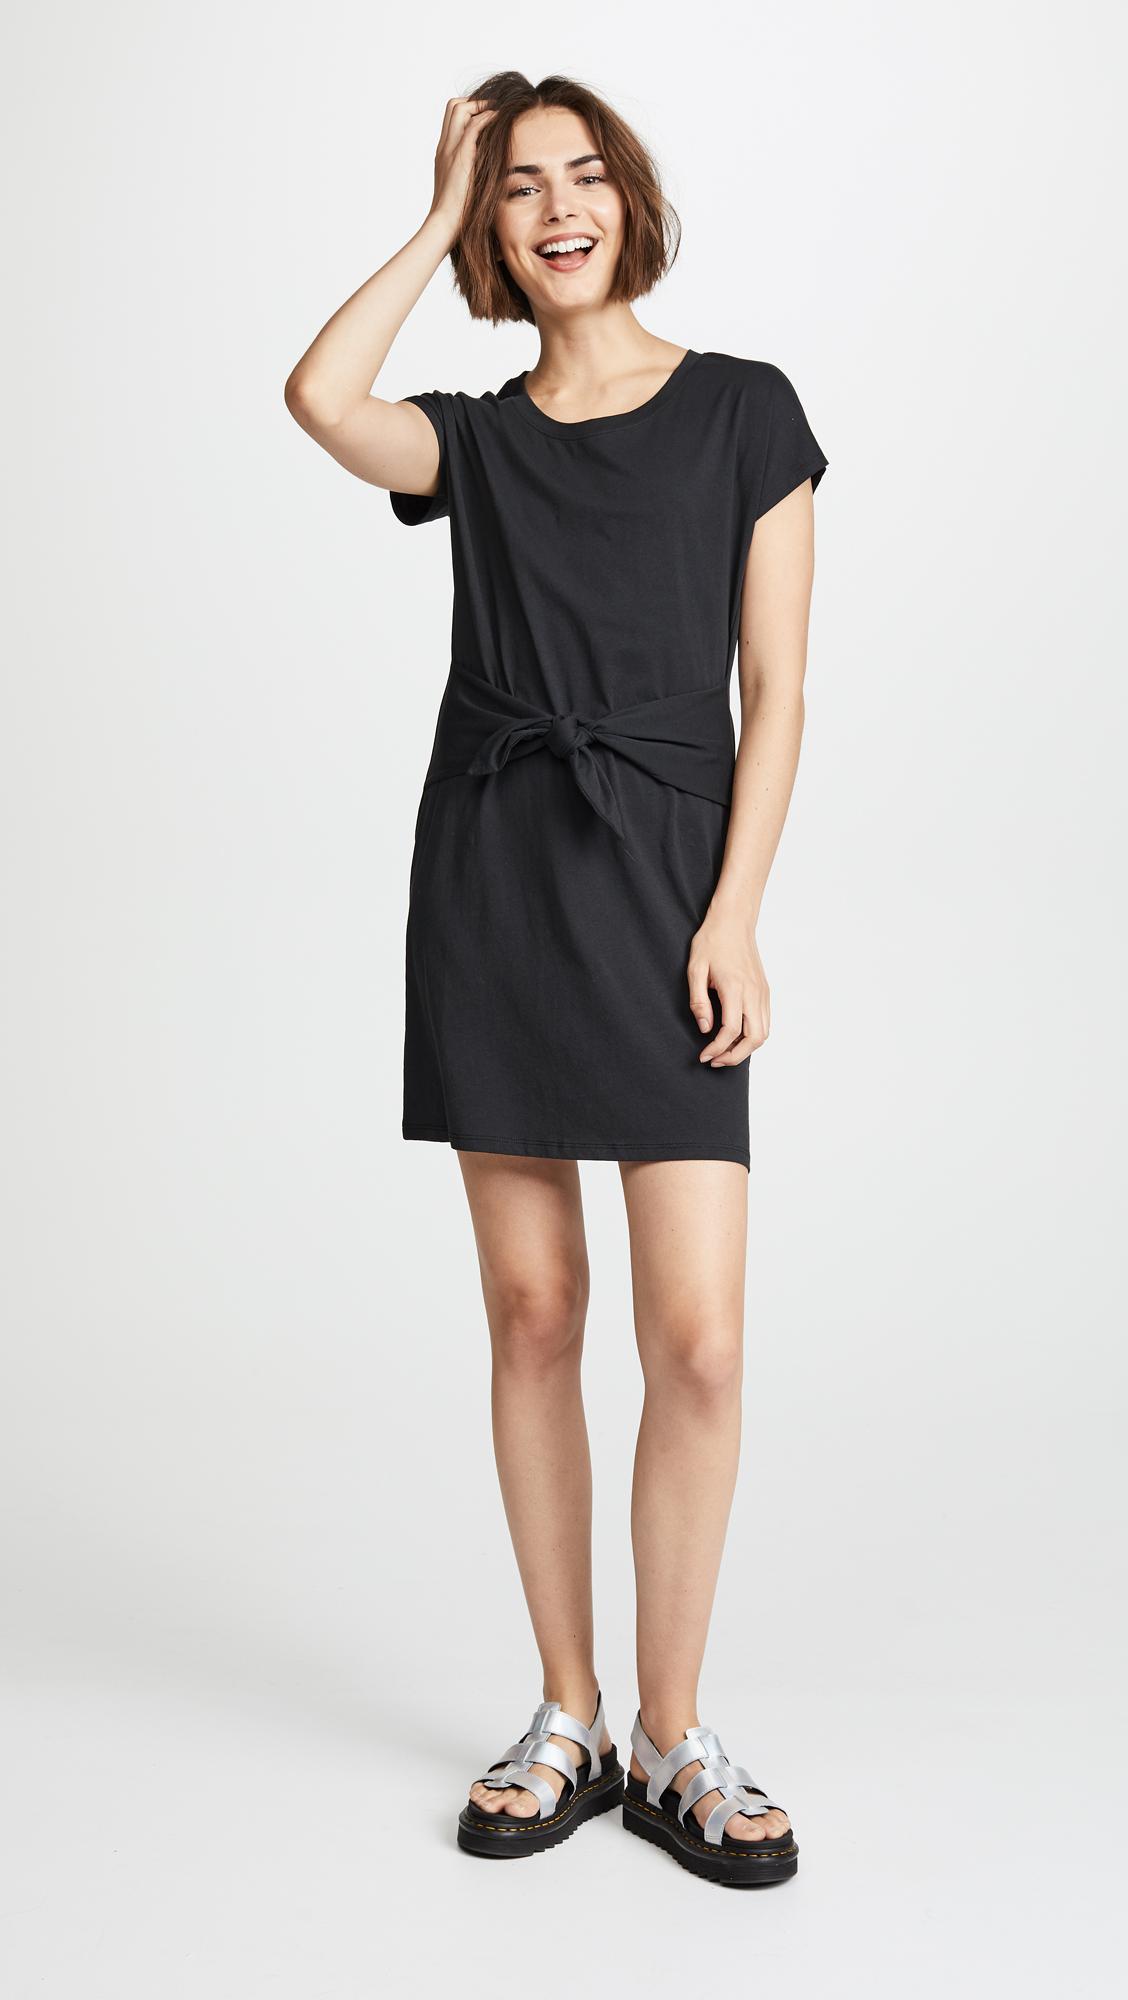 Joie Alyra Dress Shopbop Jolie Clothing Georgia Mini